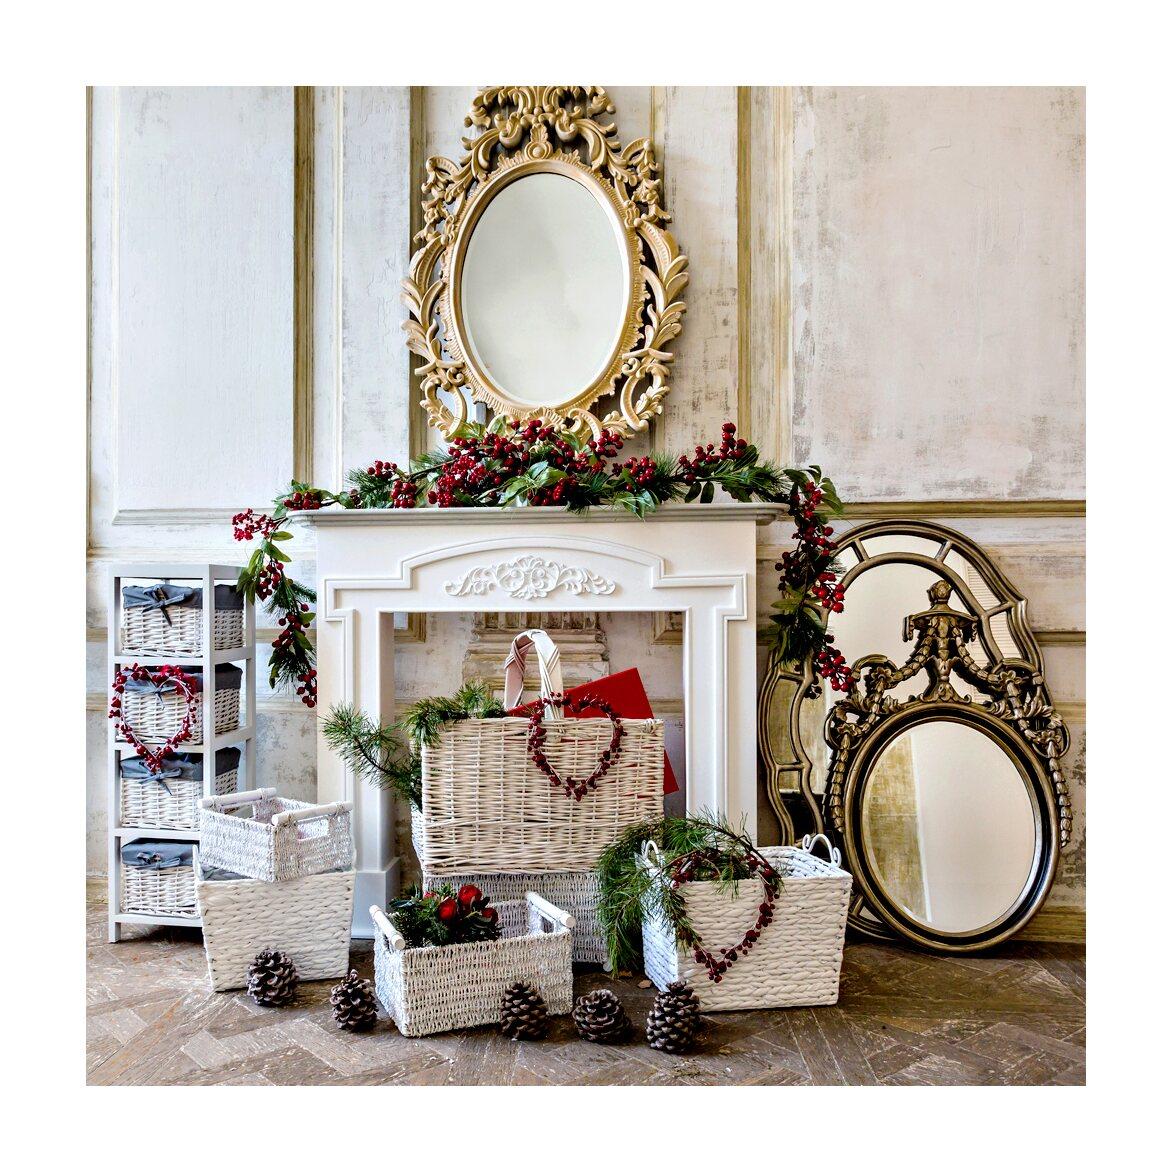 Настенное зеркало «Марлен» 4 | Настенные зеркала Kingsby